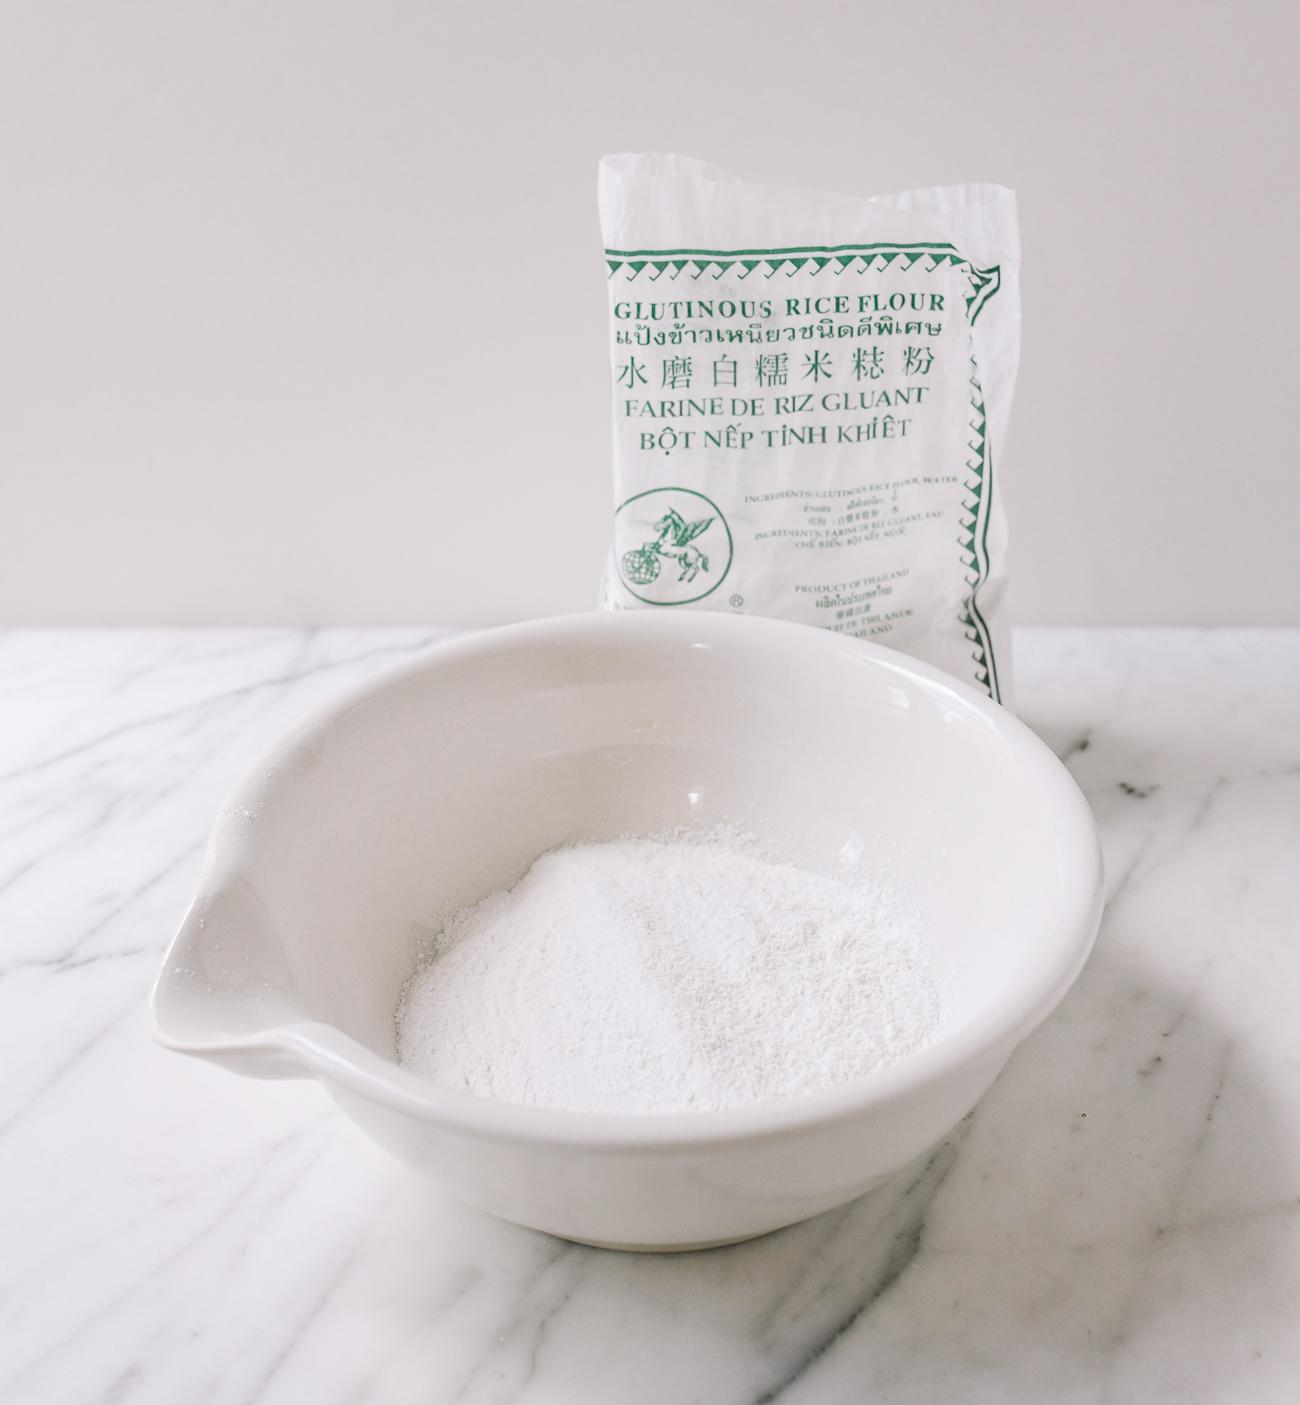 Glutinous rice flour and sugar in mixing bowl, thewoksoflife.com